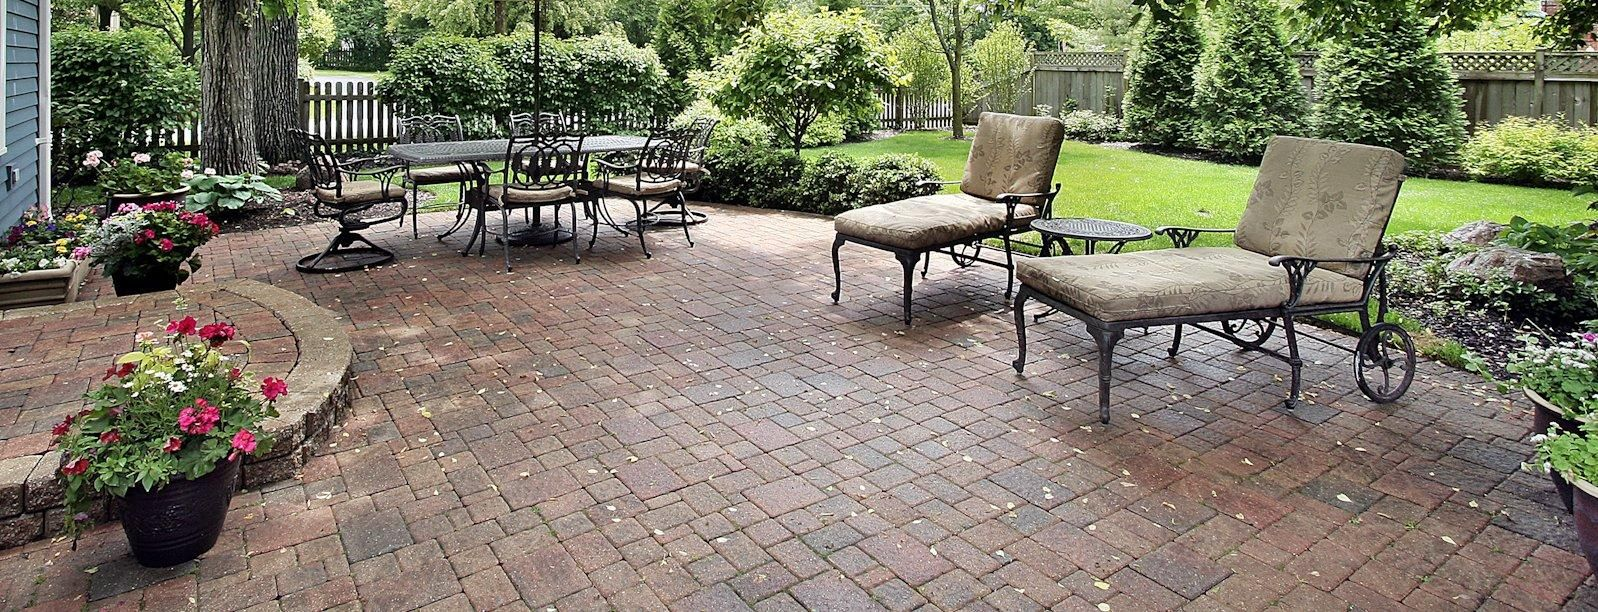 Simple Concrete Patio In Backyard